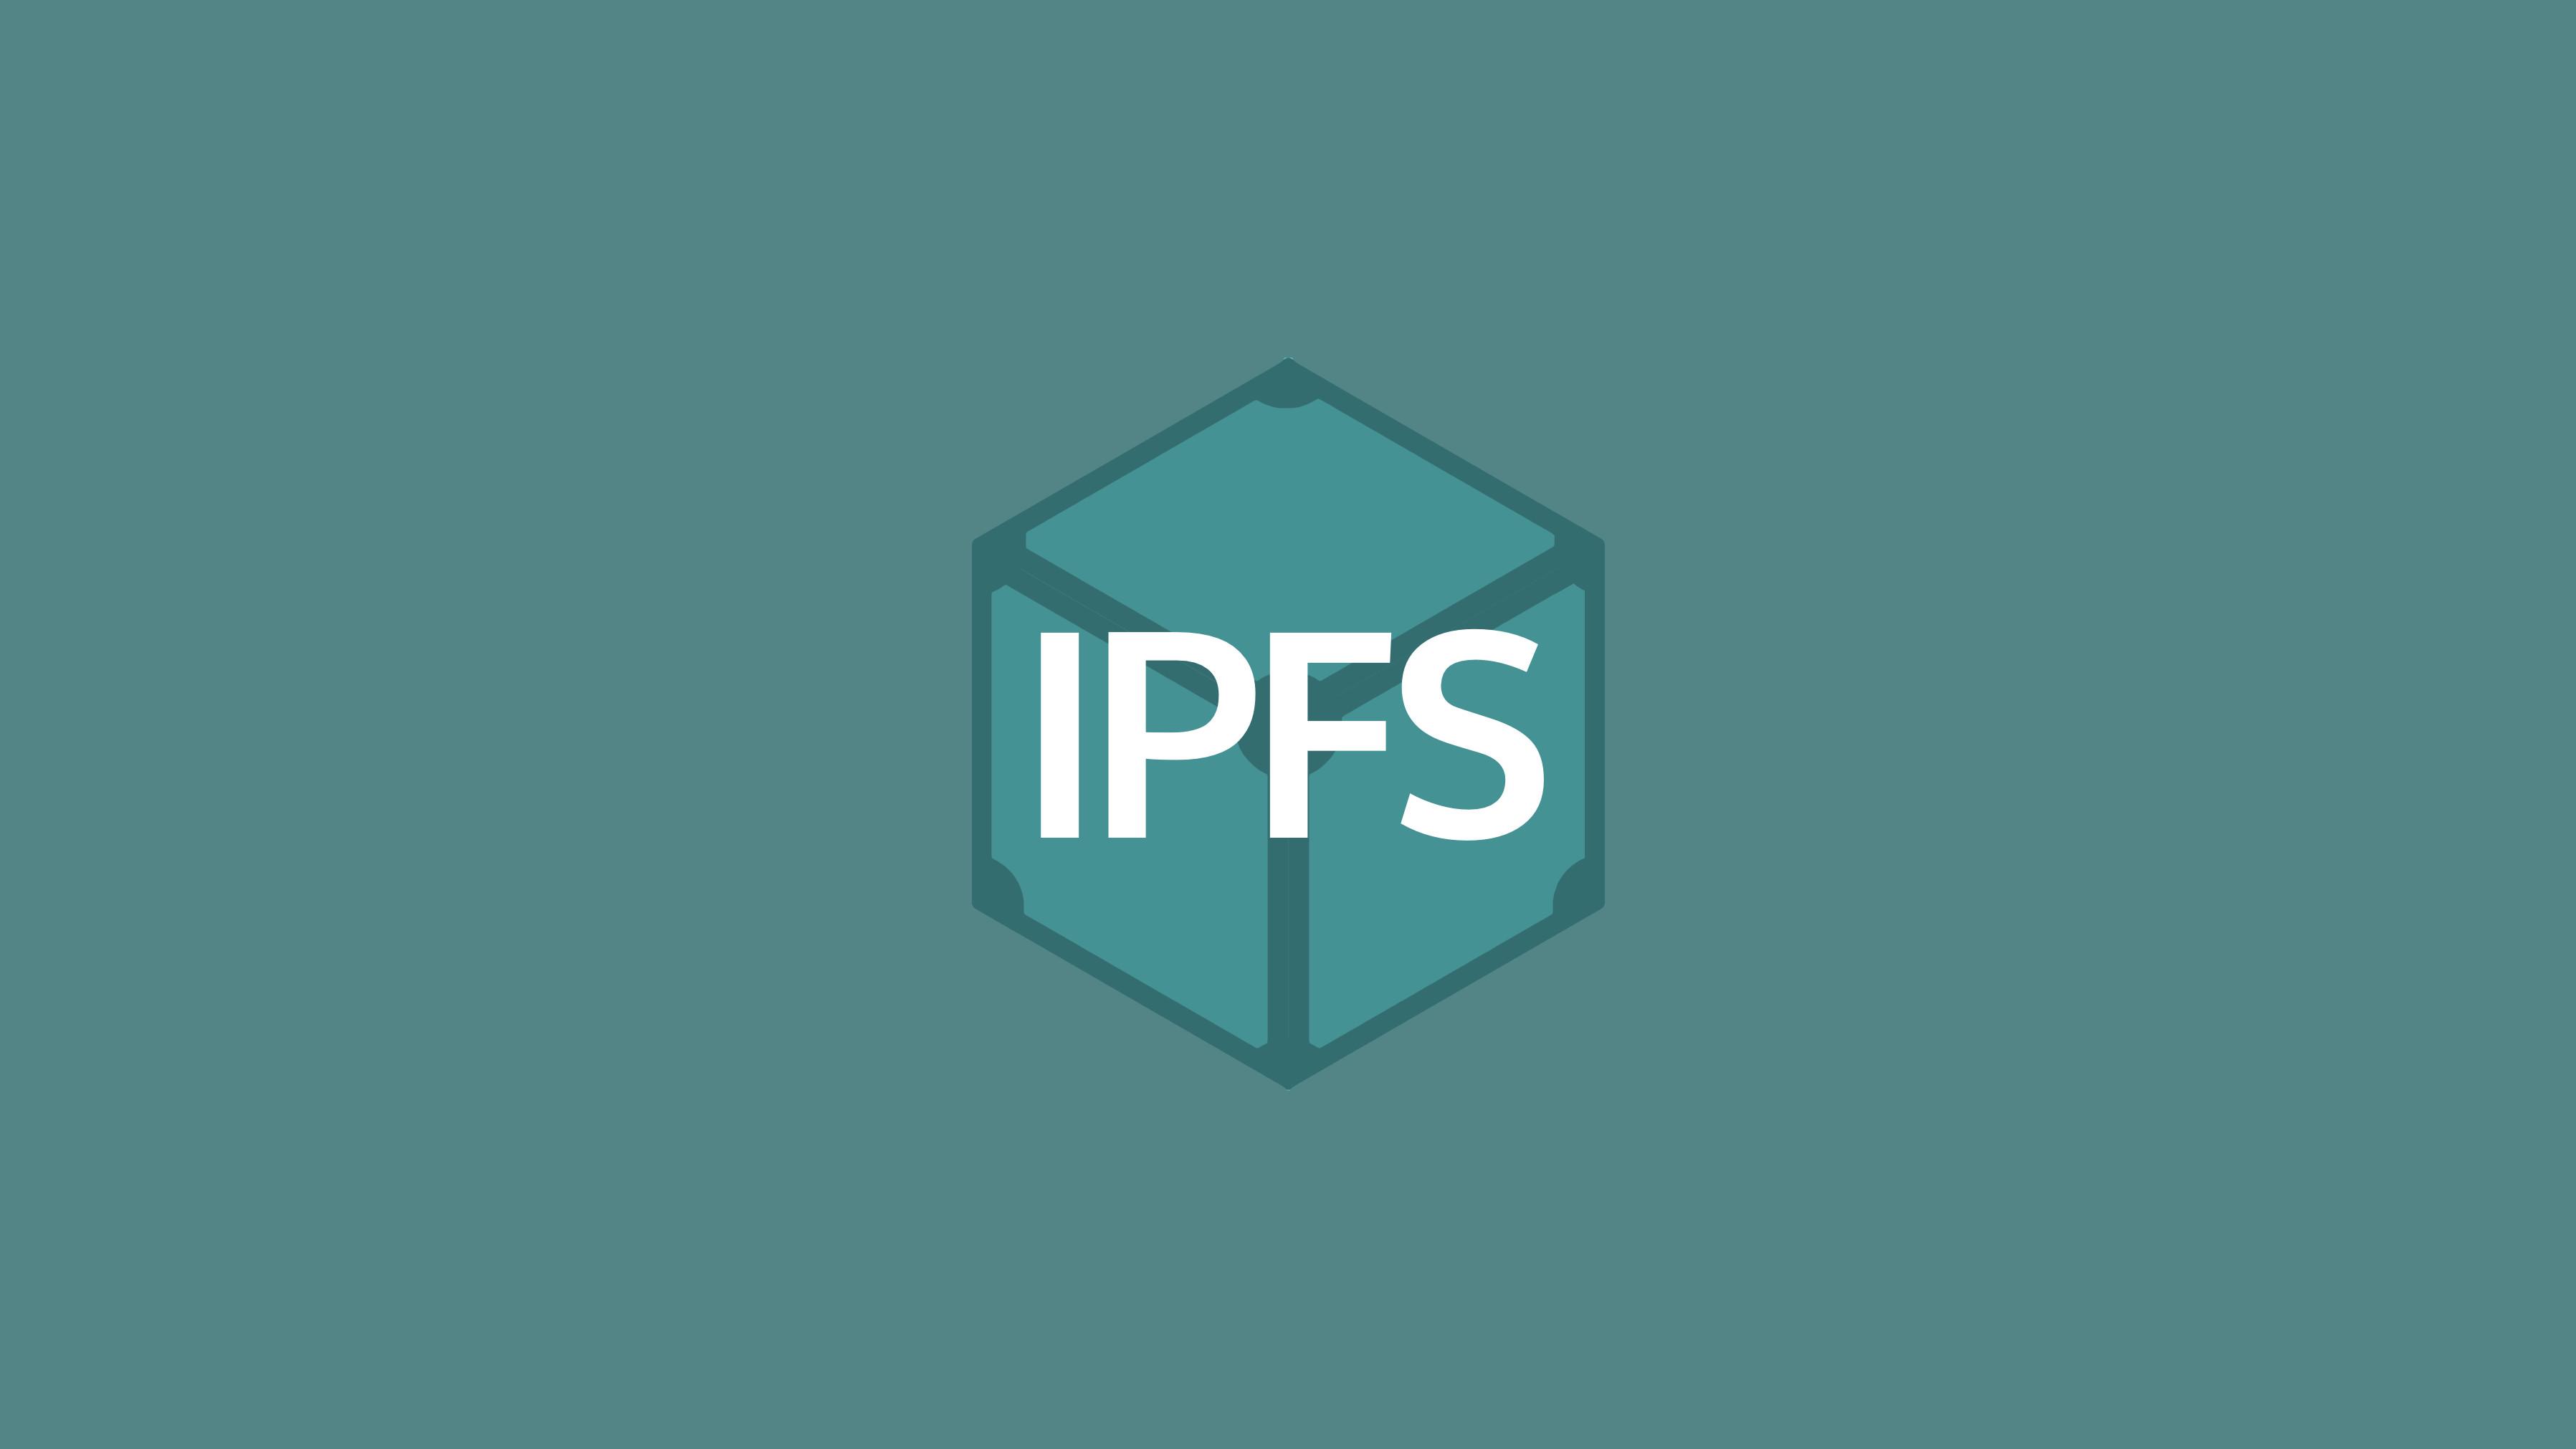 https://www.marksei.com/wp-content/uploads/2017/05/IPFS-Logo.jpg